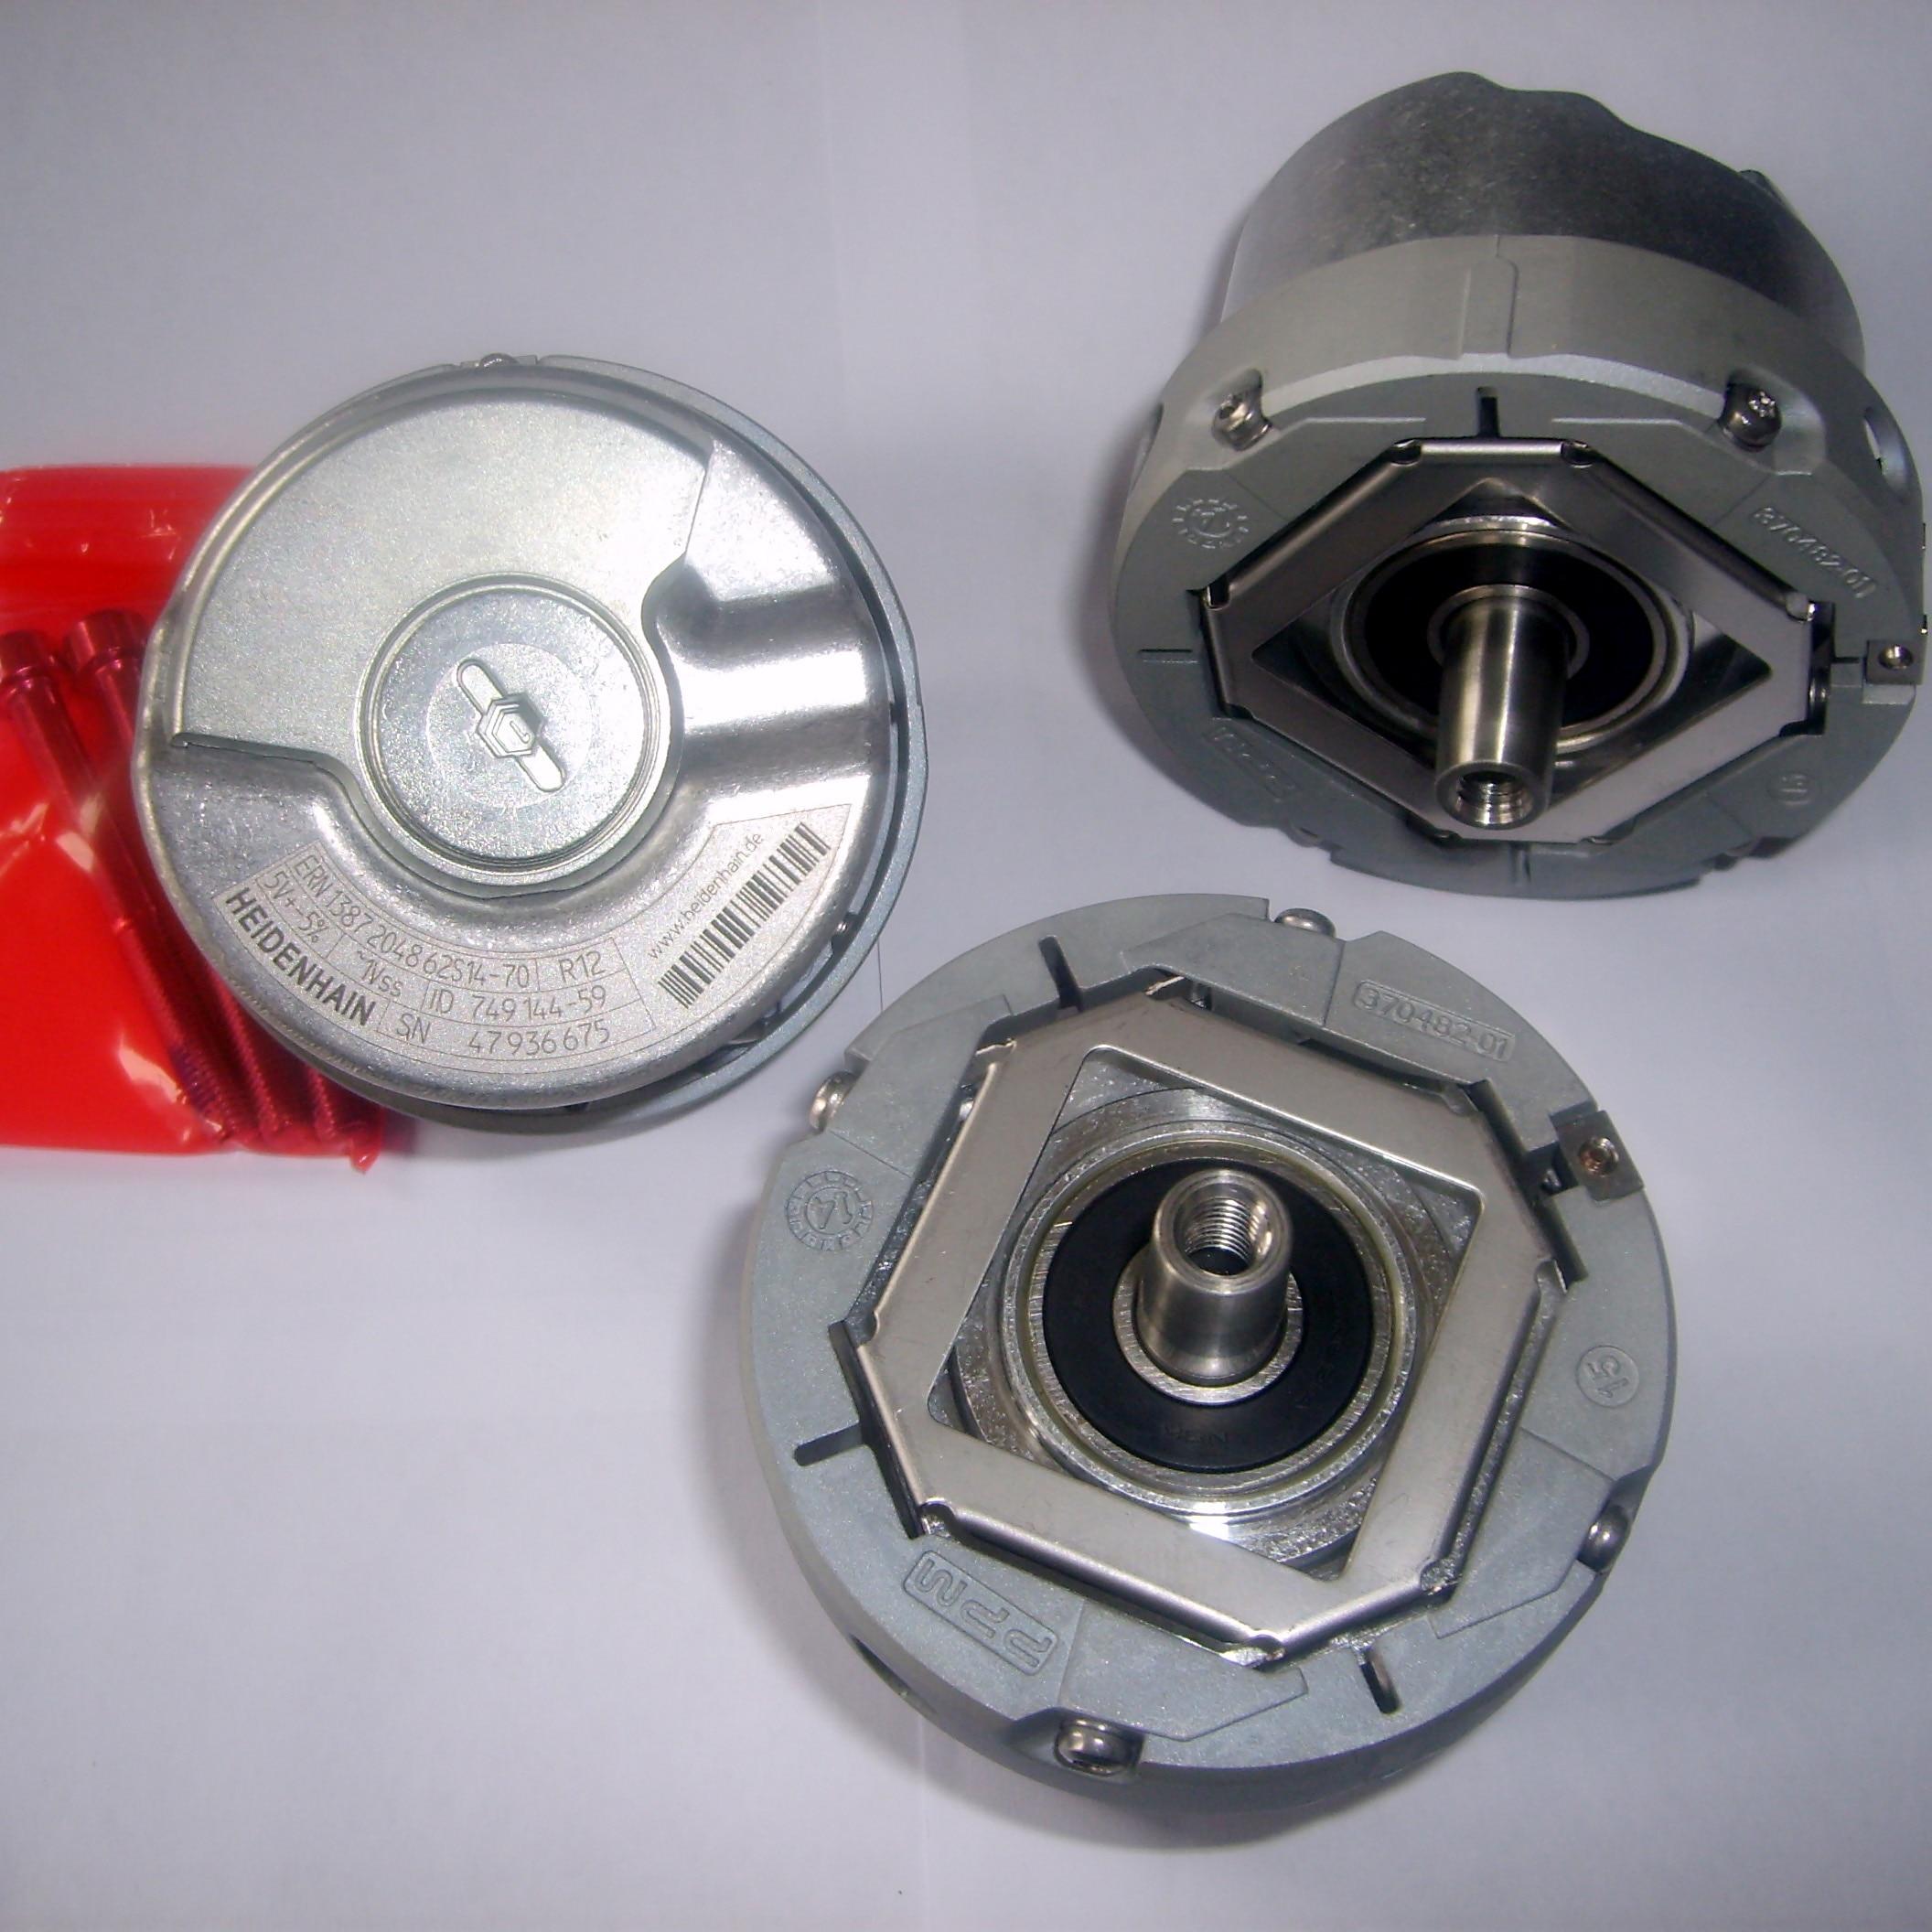 NEW ENCODER ECN 1313 2048 62S12-78 Rotary Encoder Resolver ECN1313204862S12-78 brand new rotary encoder resolver oih 48 1024p6 l6 5v ts5208n510